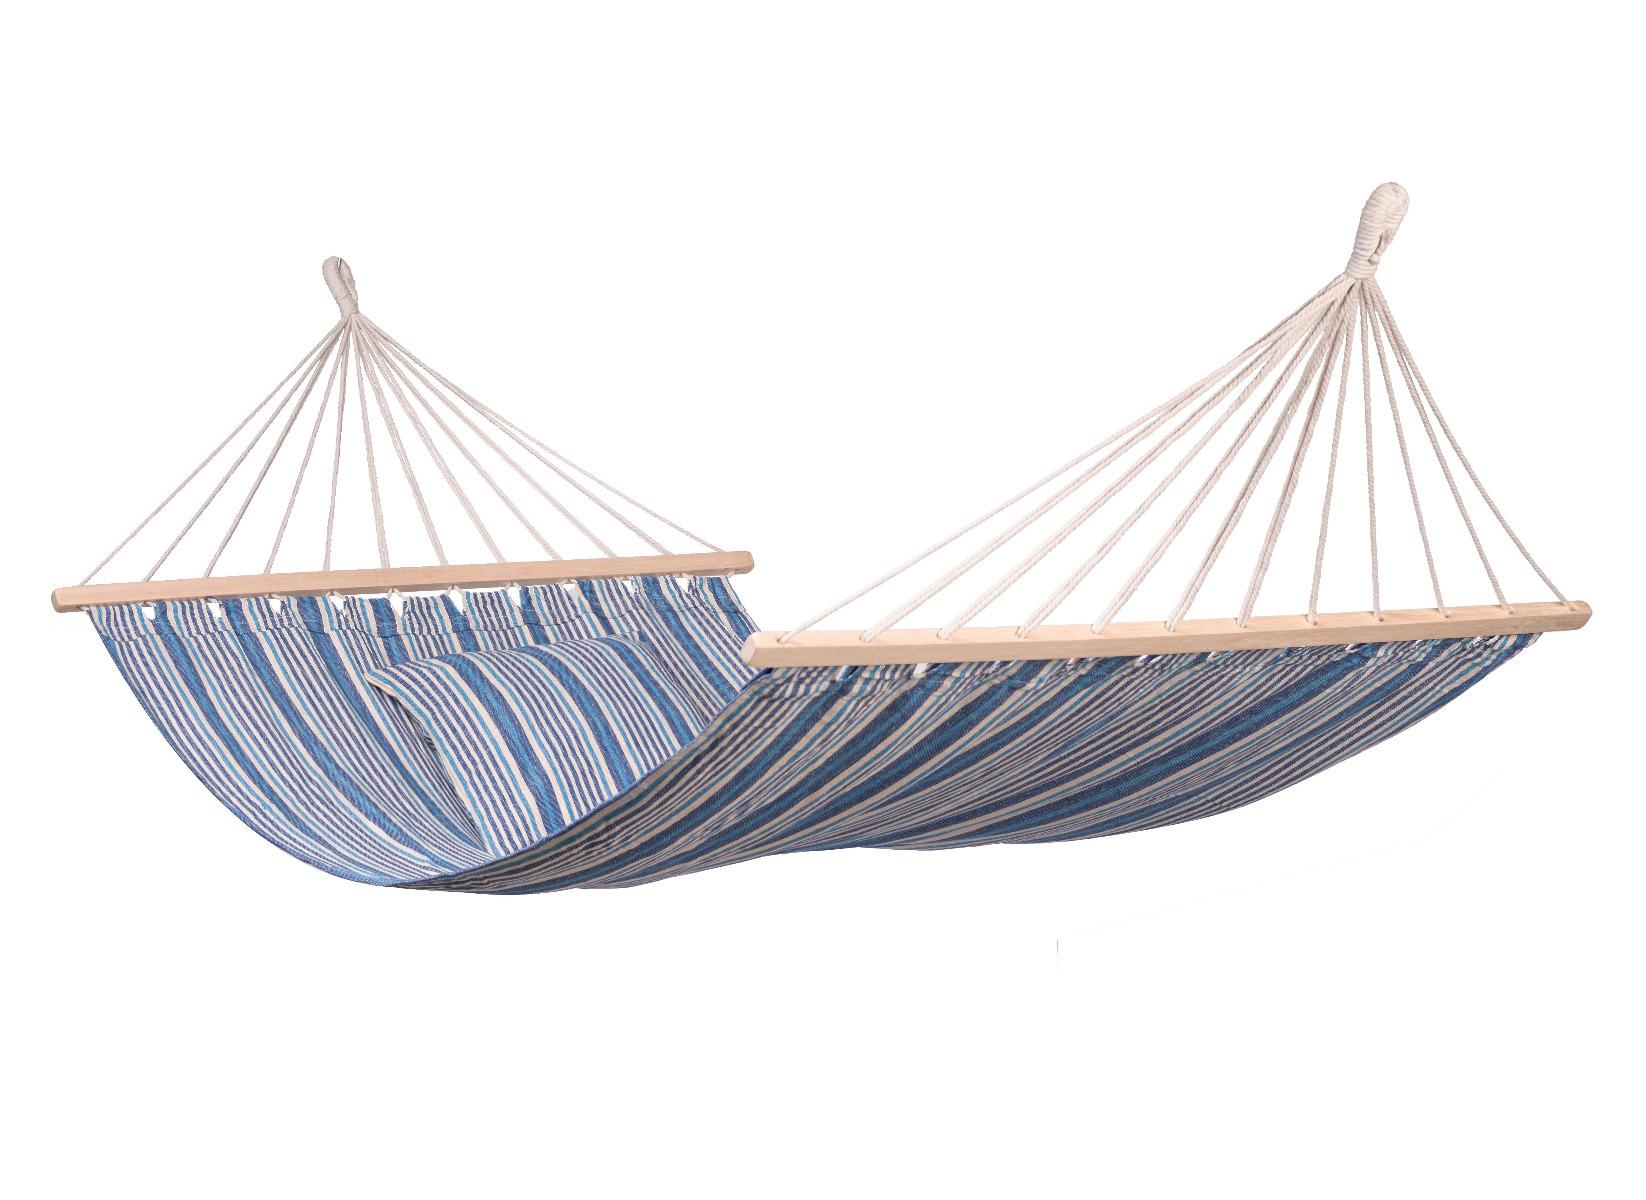 'Rustic' Spreaderbar E�npersoons Hangmat - Veelkleurig - 123 Hammock